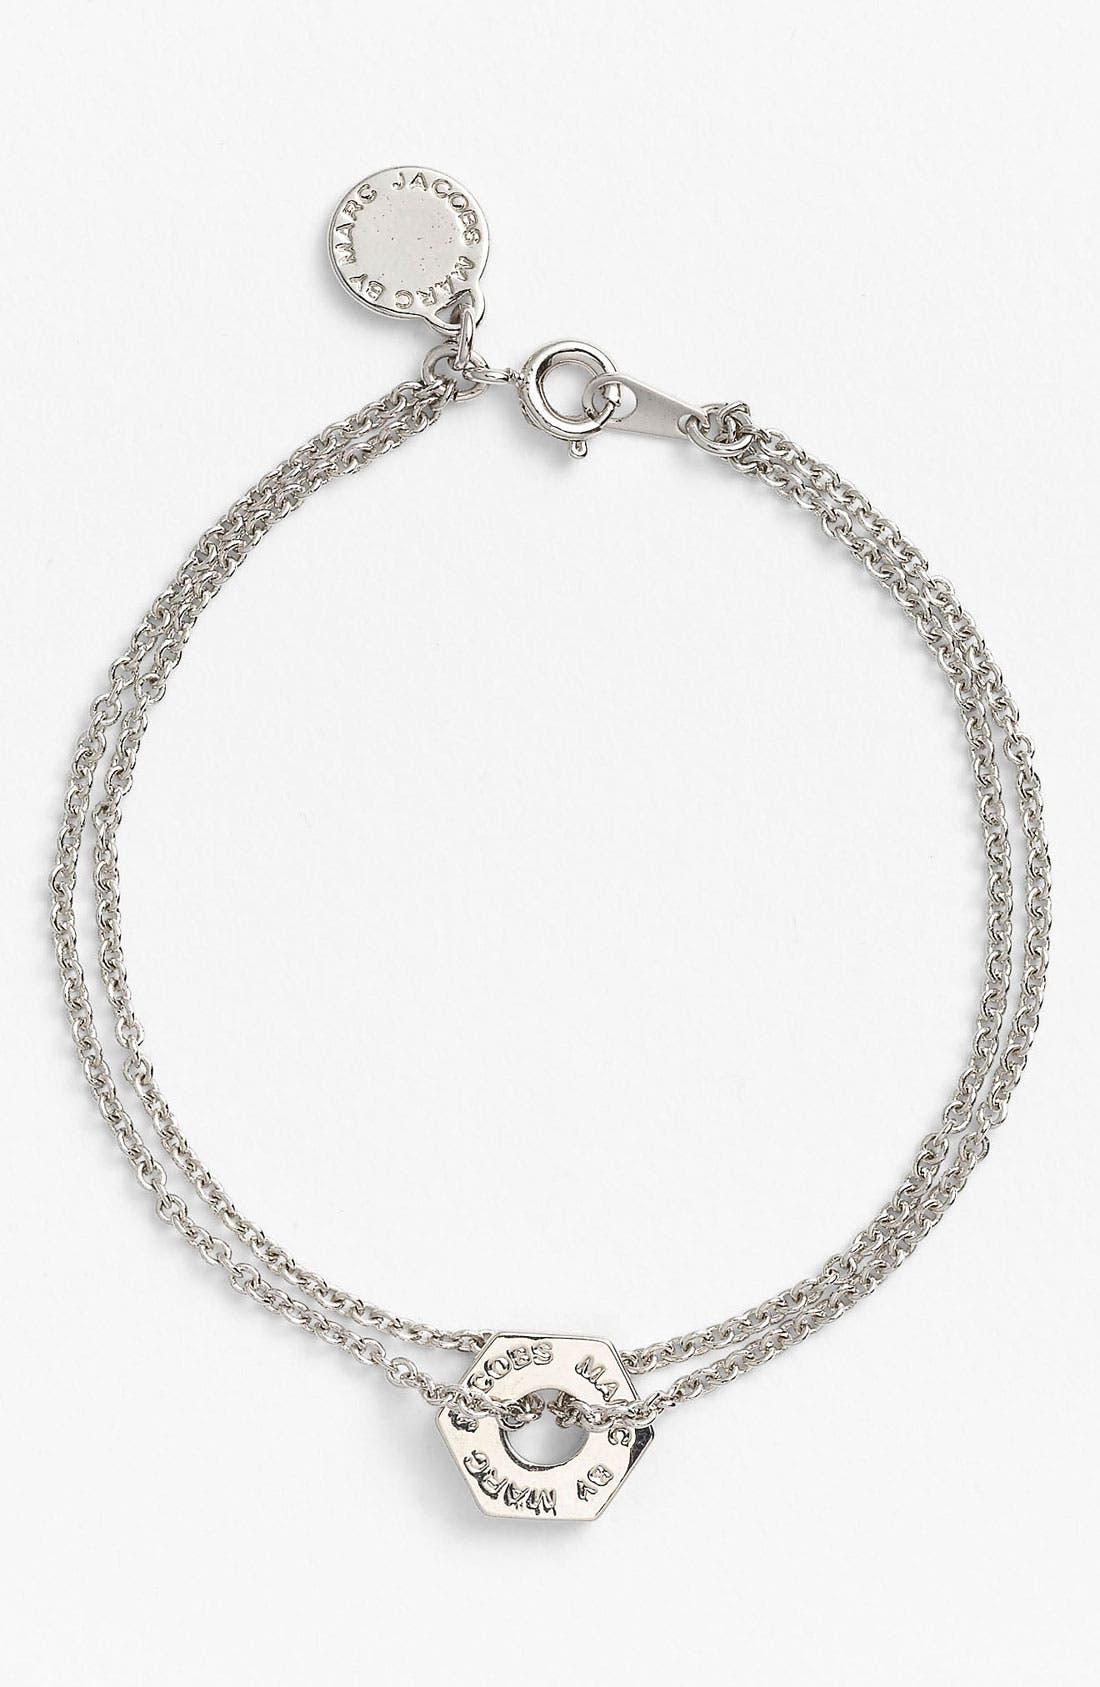 Alternate Image 1 Selected - MARC BY MARC JACOBS 'Bolts' Line Bracelet